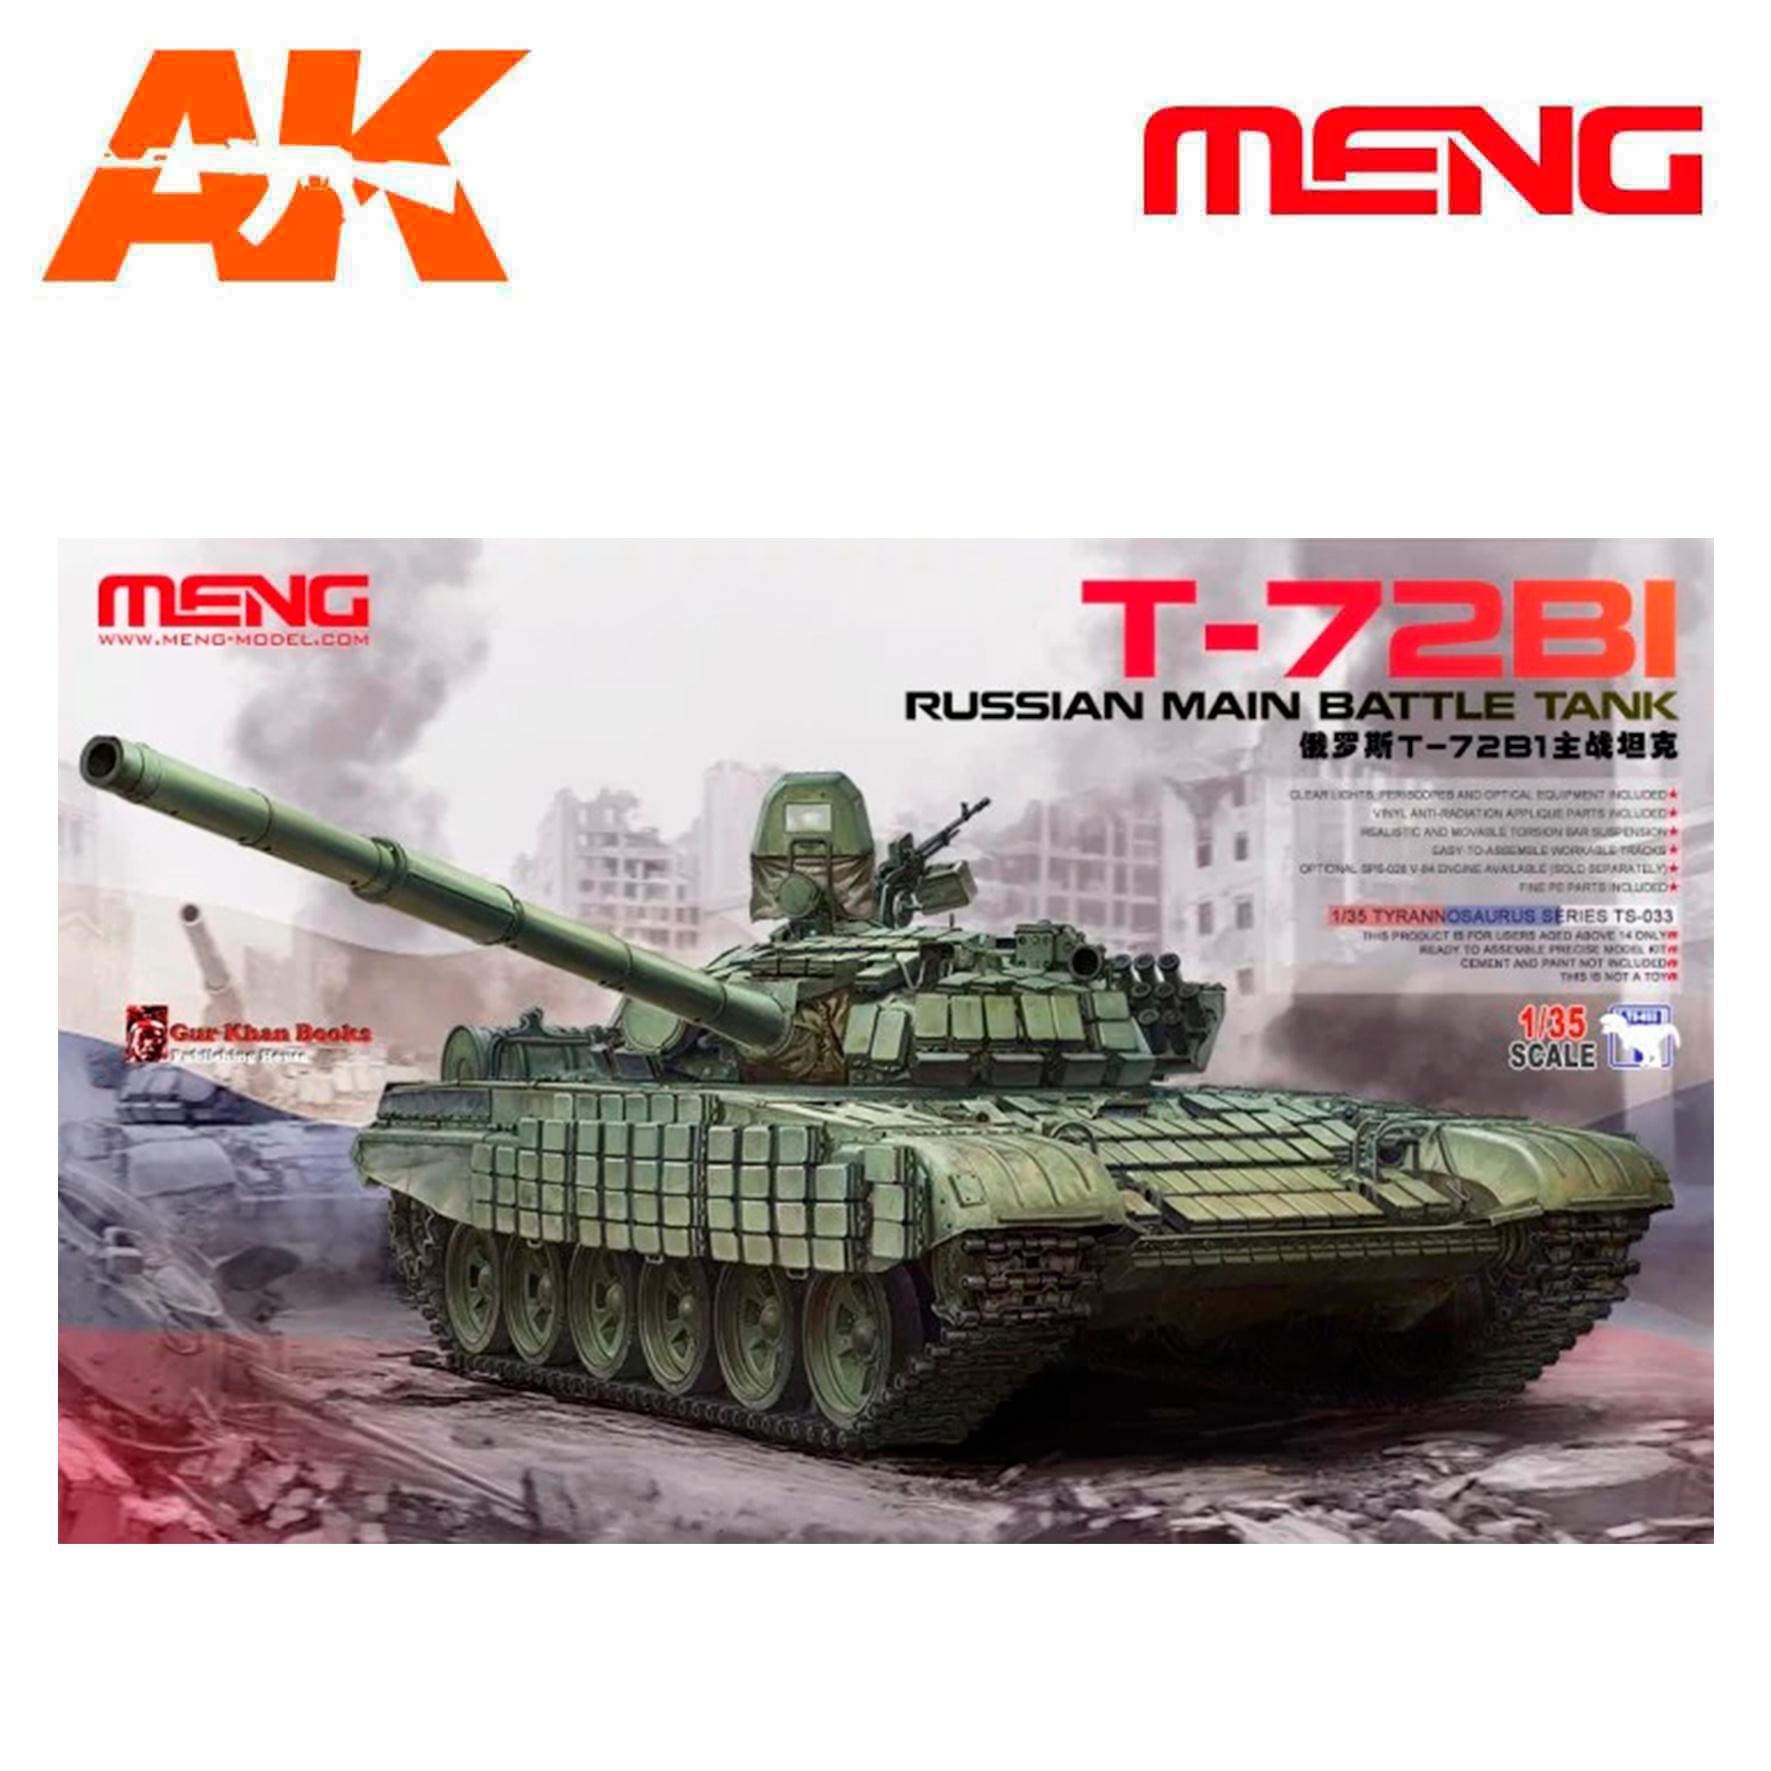 Meng Models Russian Main Battle Tank T-72B1 - Scale 1/35 - Meng Models - MM TS-033